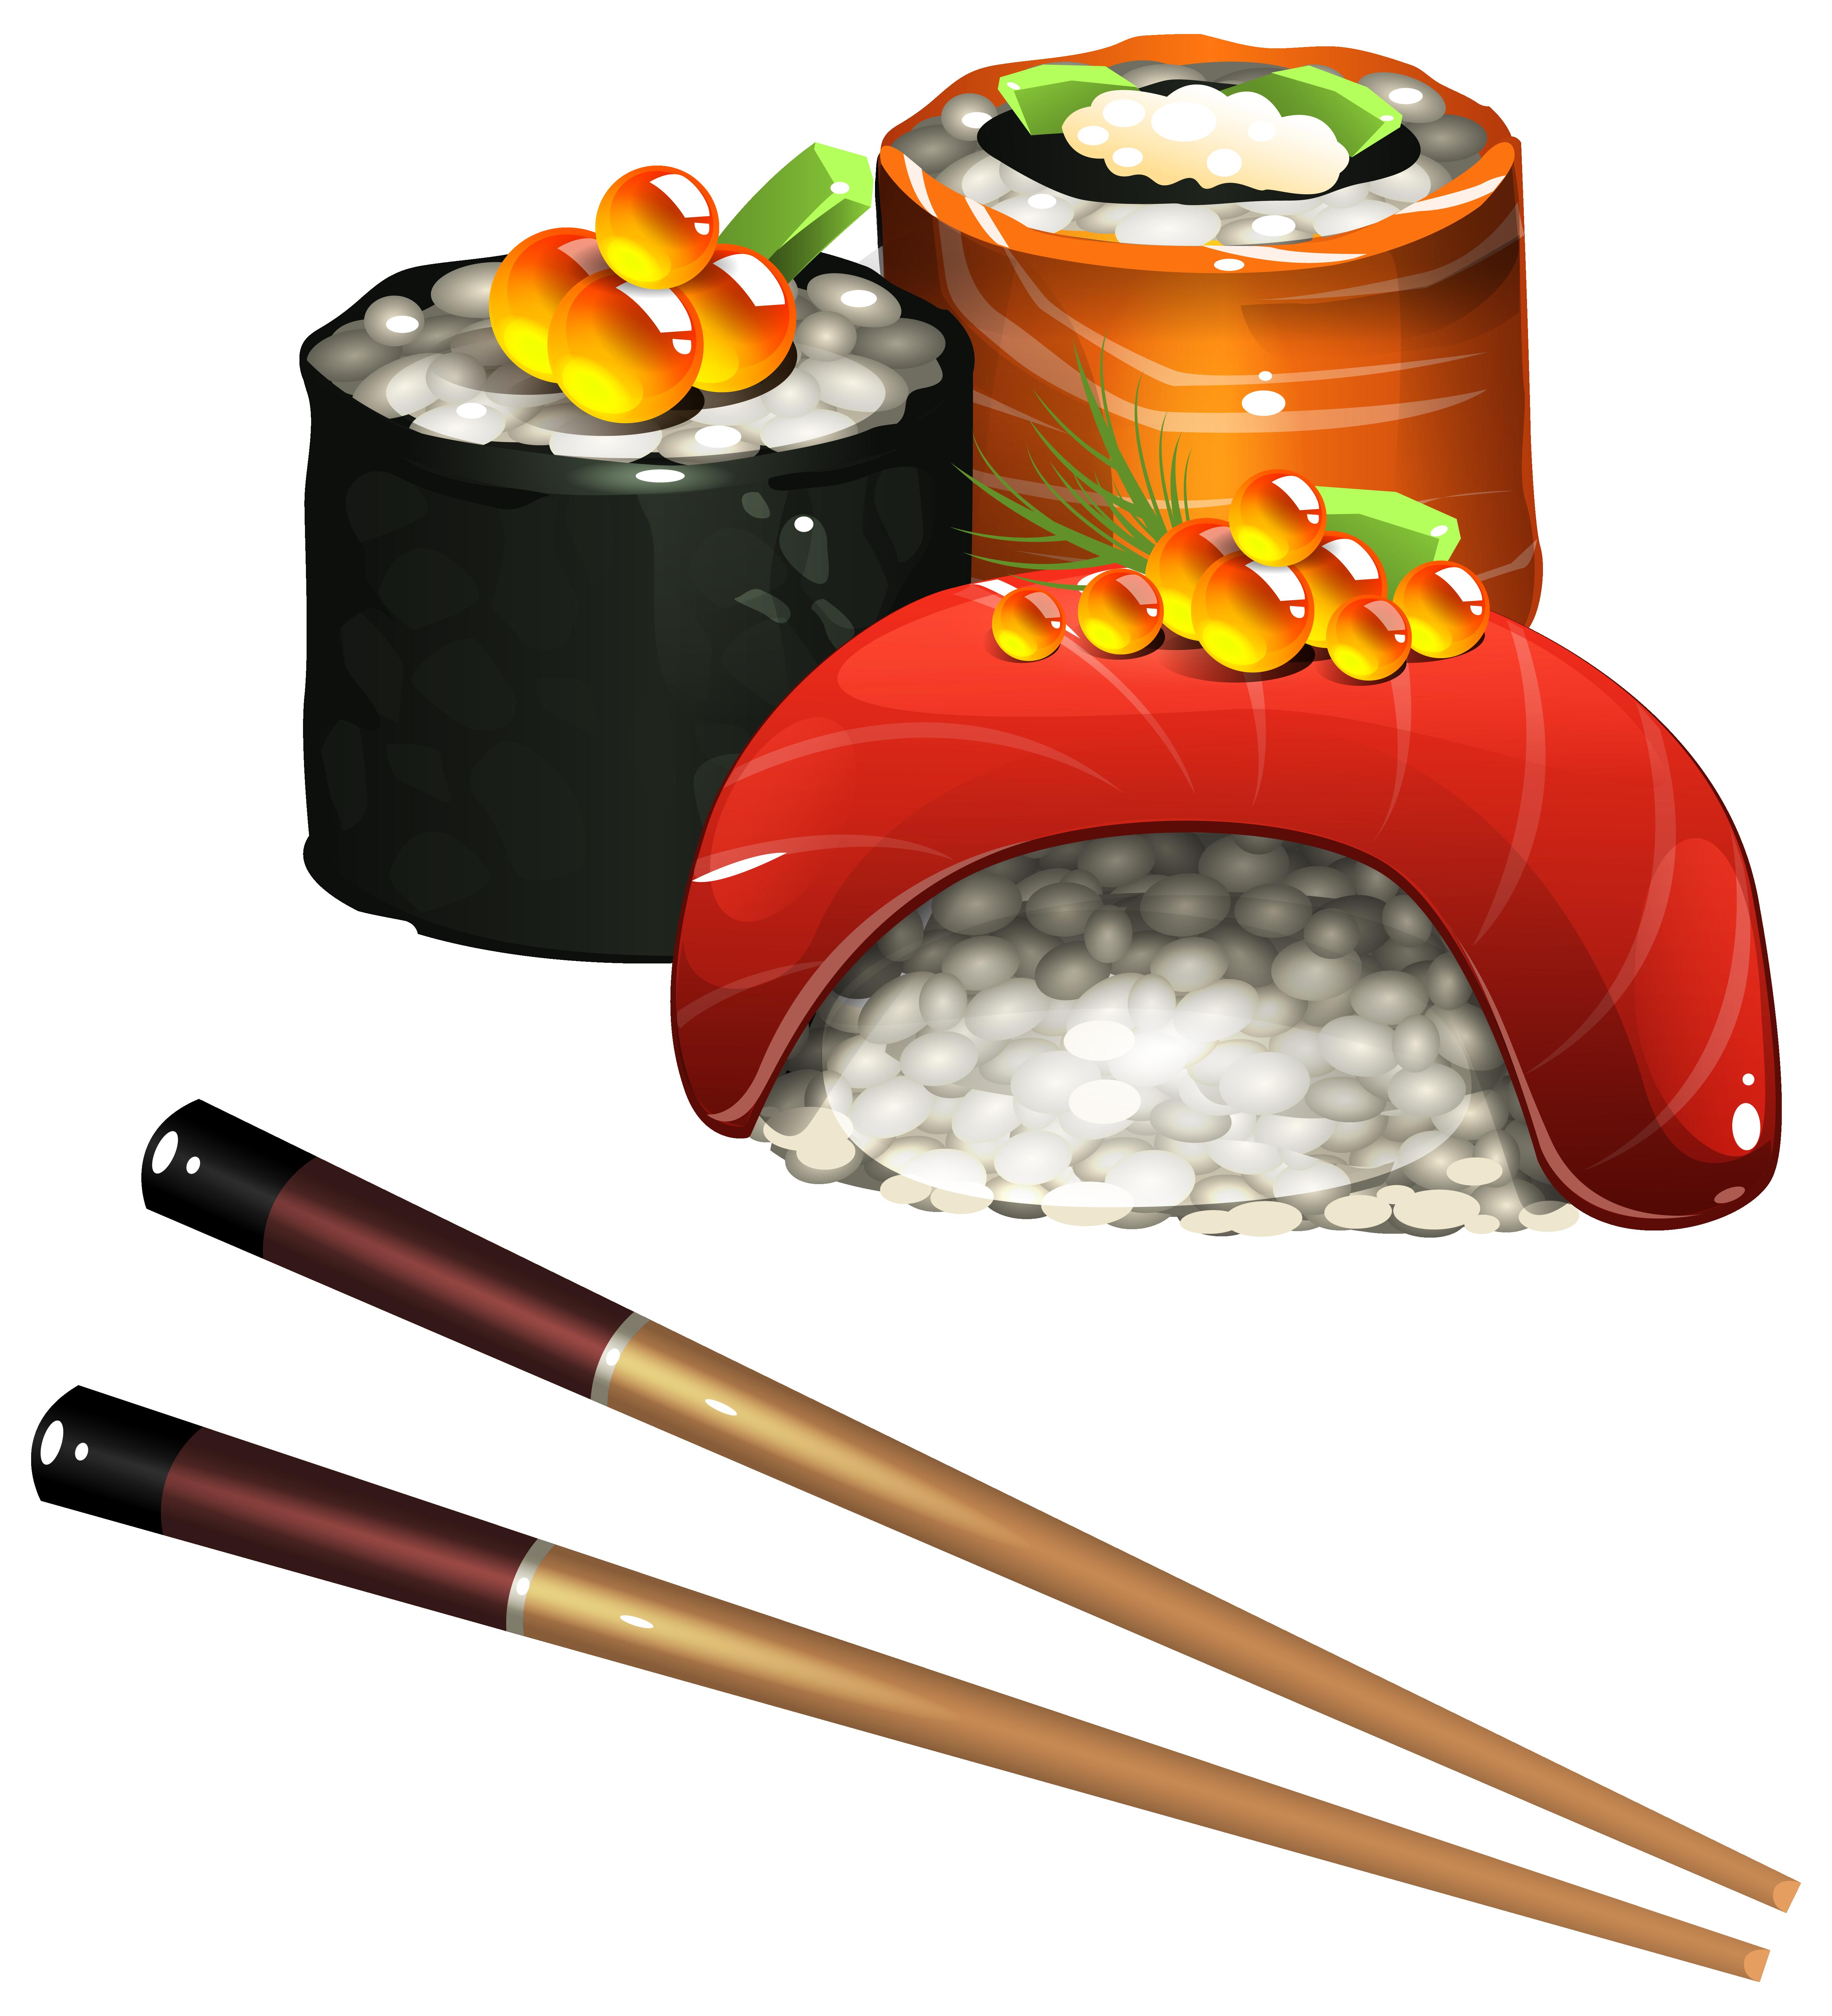 ... Sushi Set PNG Clipart Image